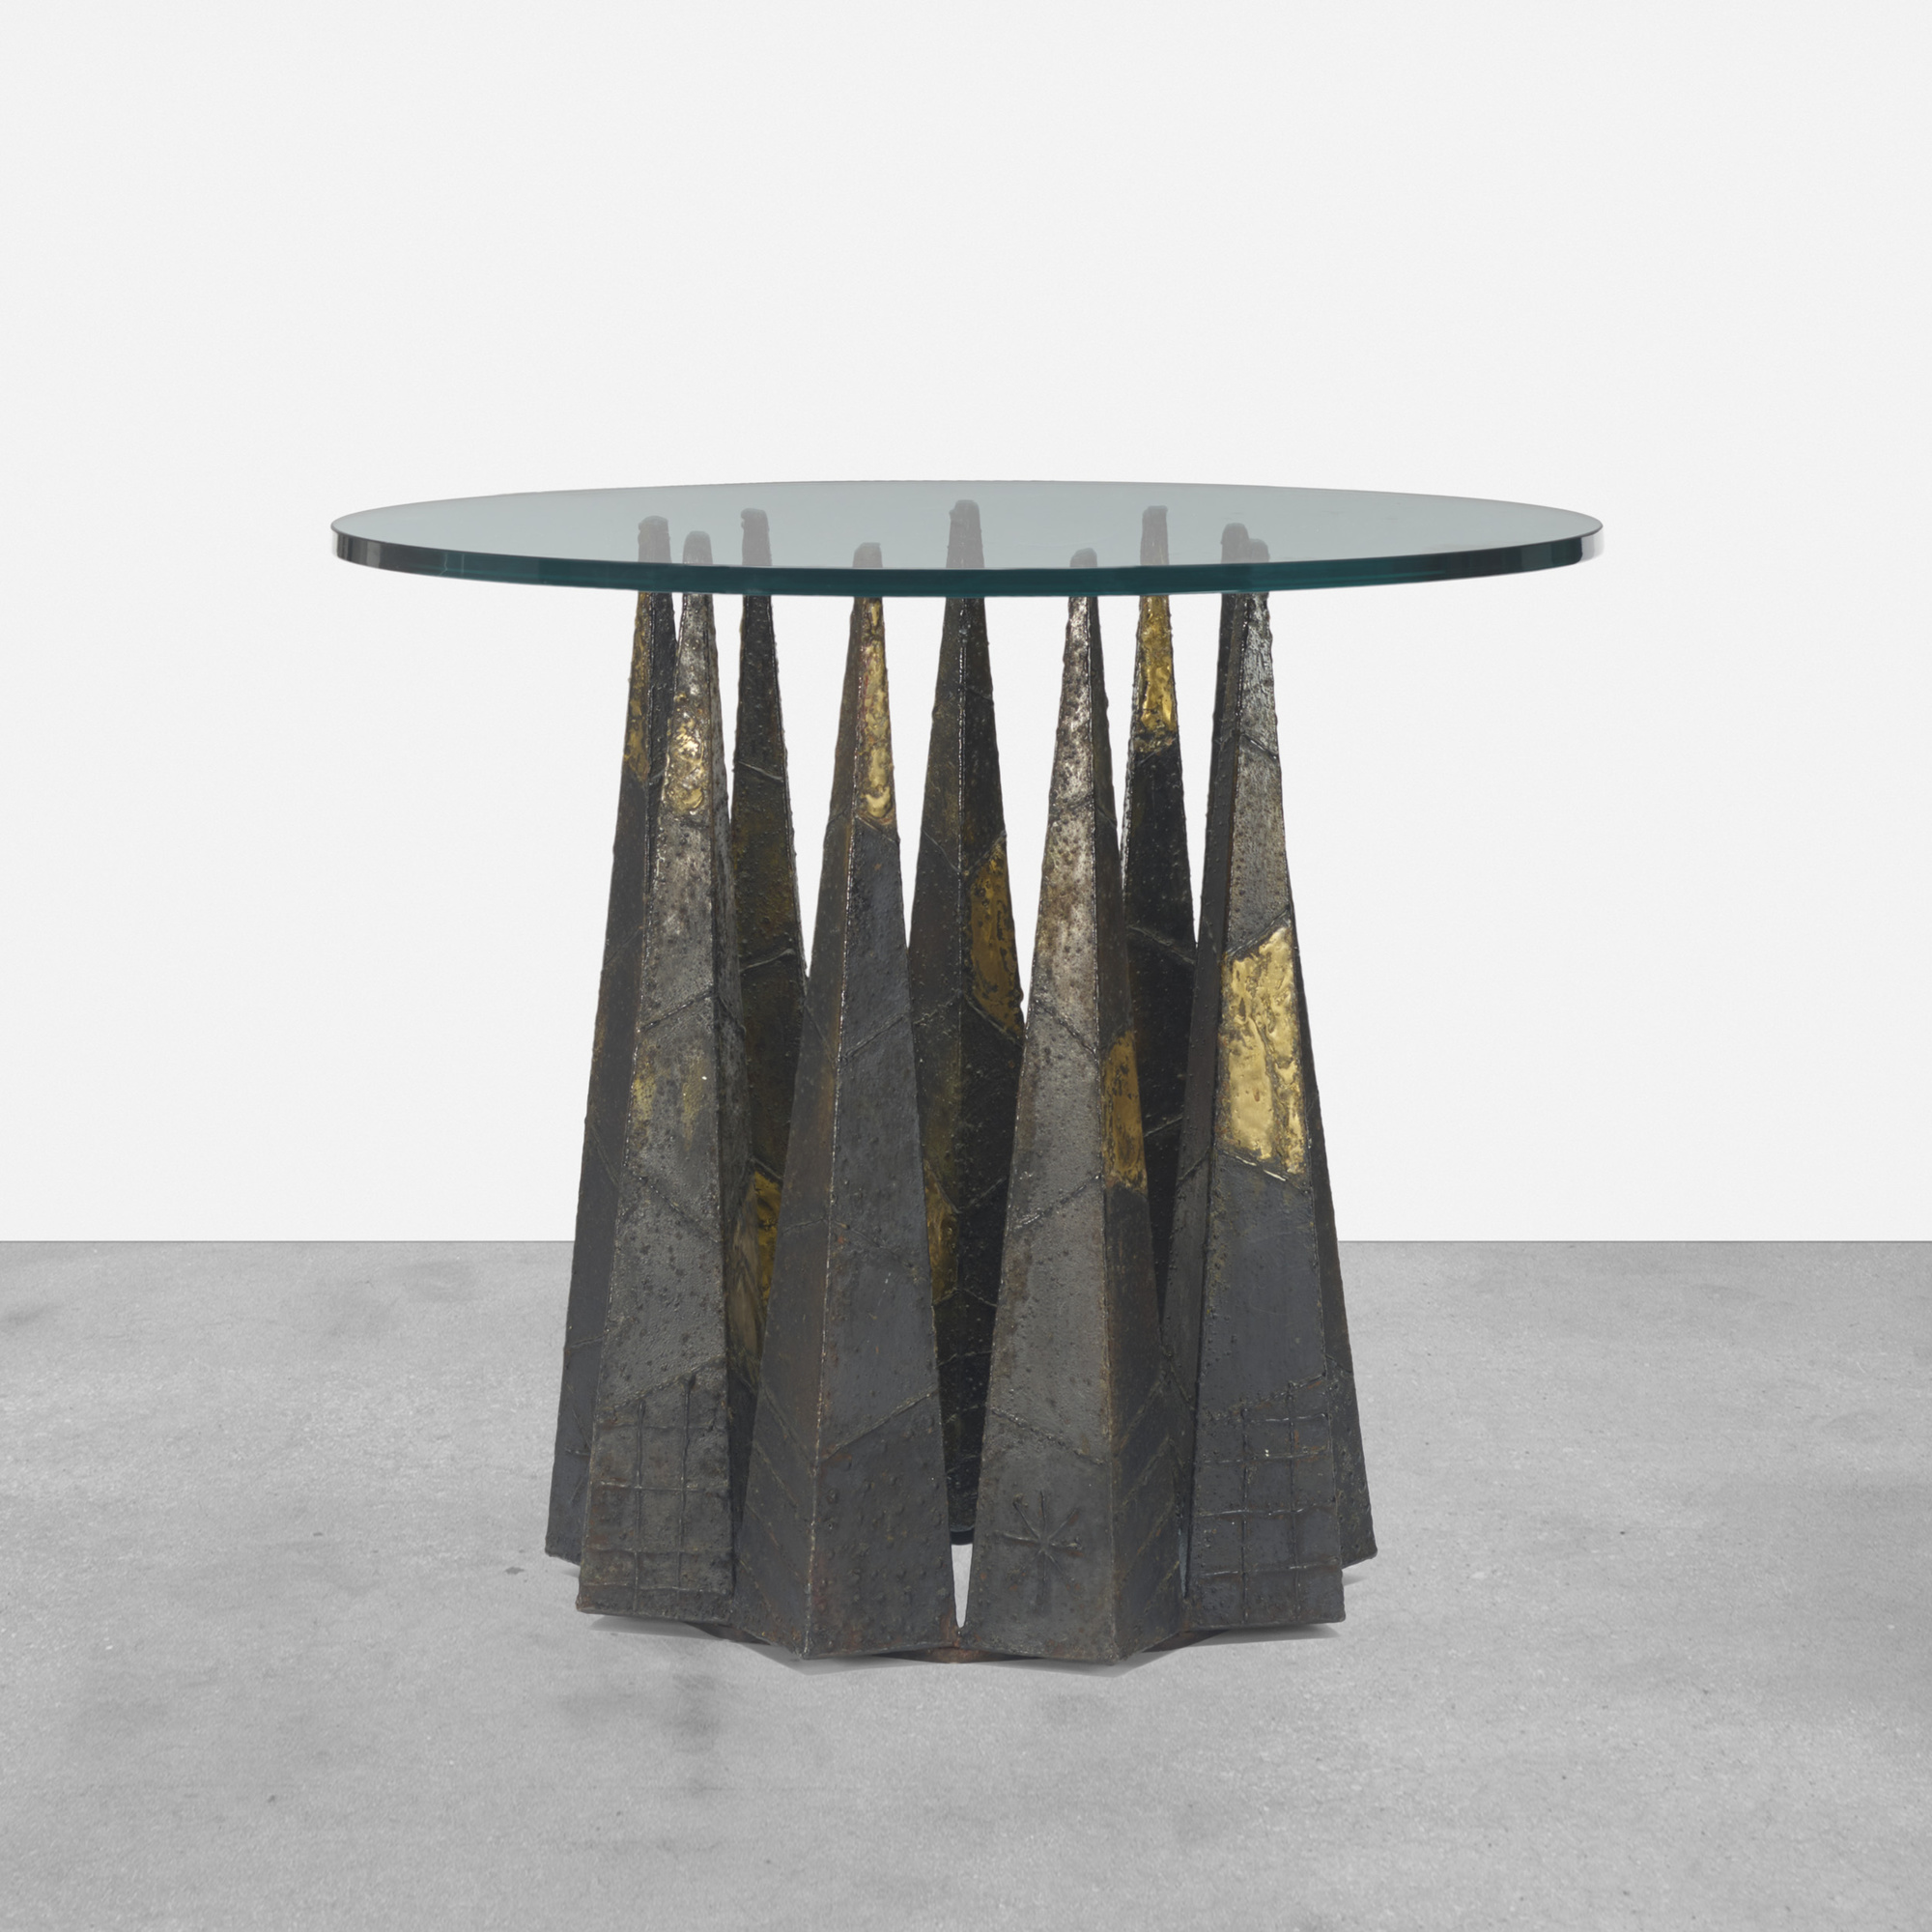 140: Paul Evans / dining table, model PE 46 (1 of 2)